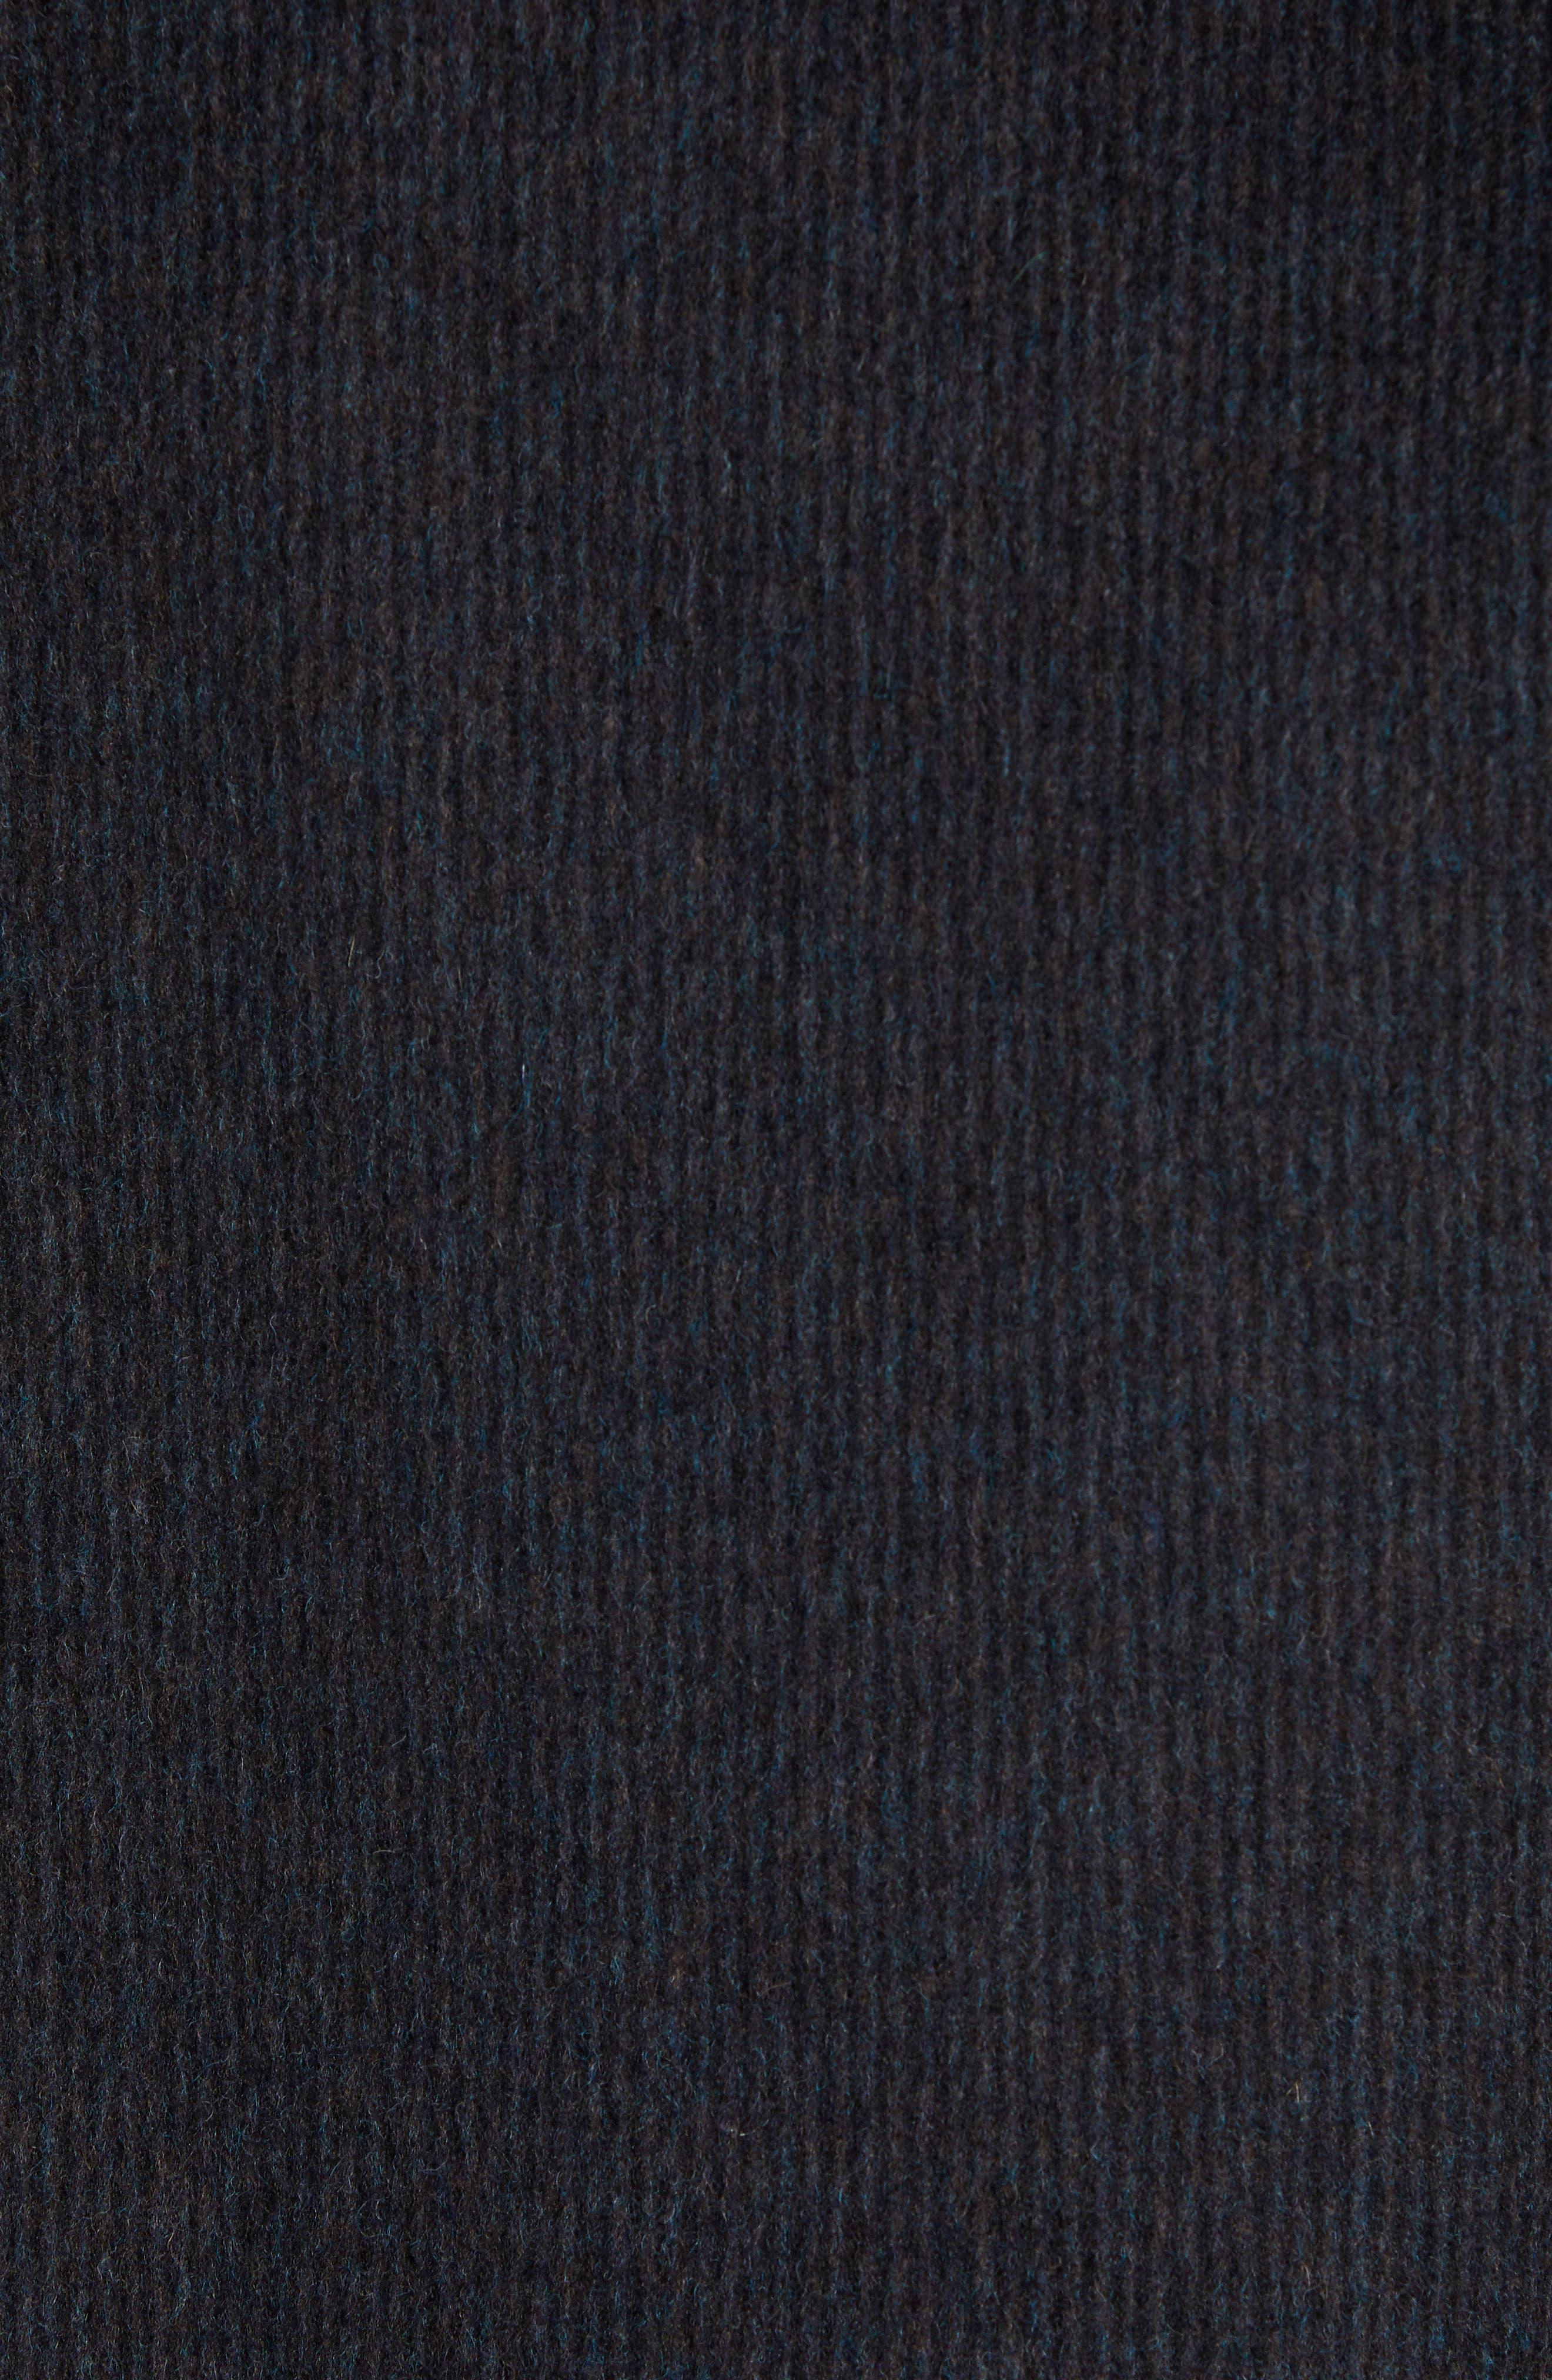 Wool Blend Car Coat,                             Alternate thumbnail 6, color,                             BLACK/ H CHARCOAL